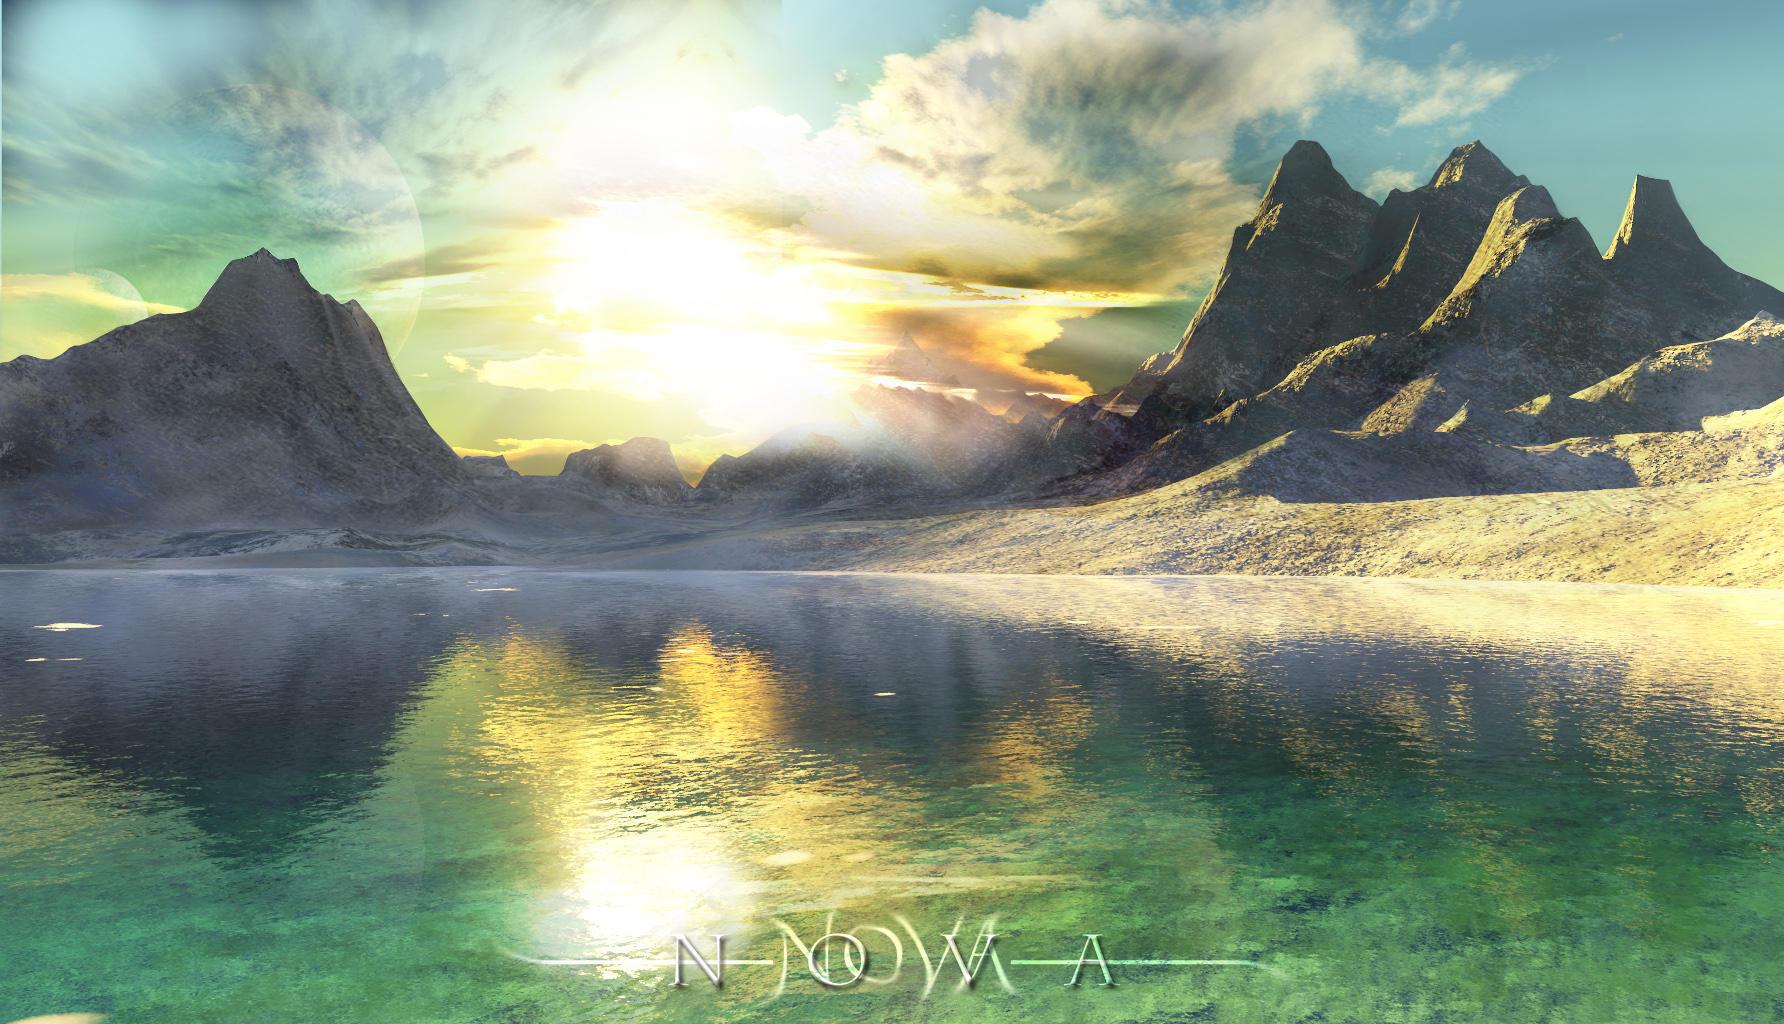 Terragen - Nova by tigaer